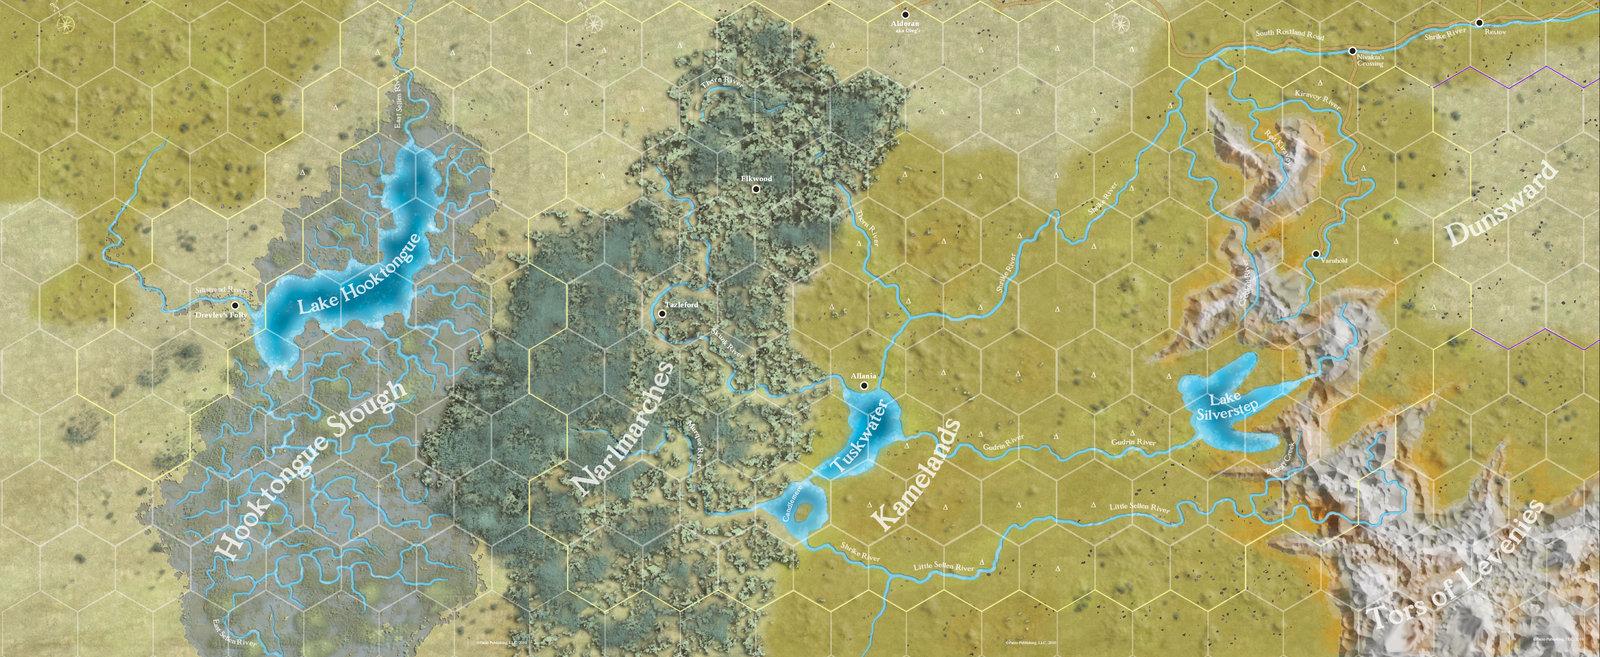 Kingmaker map